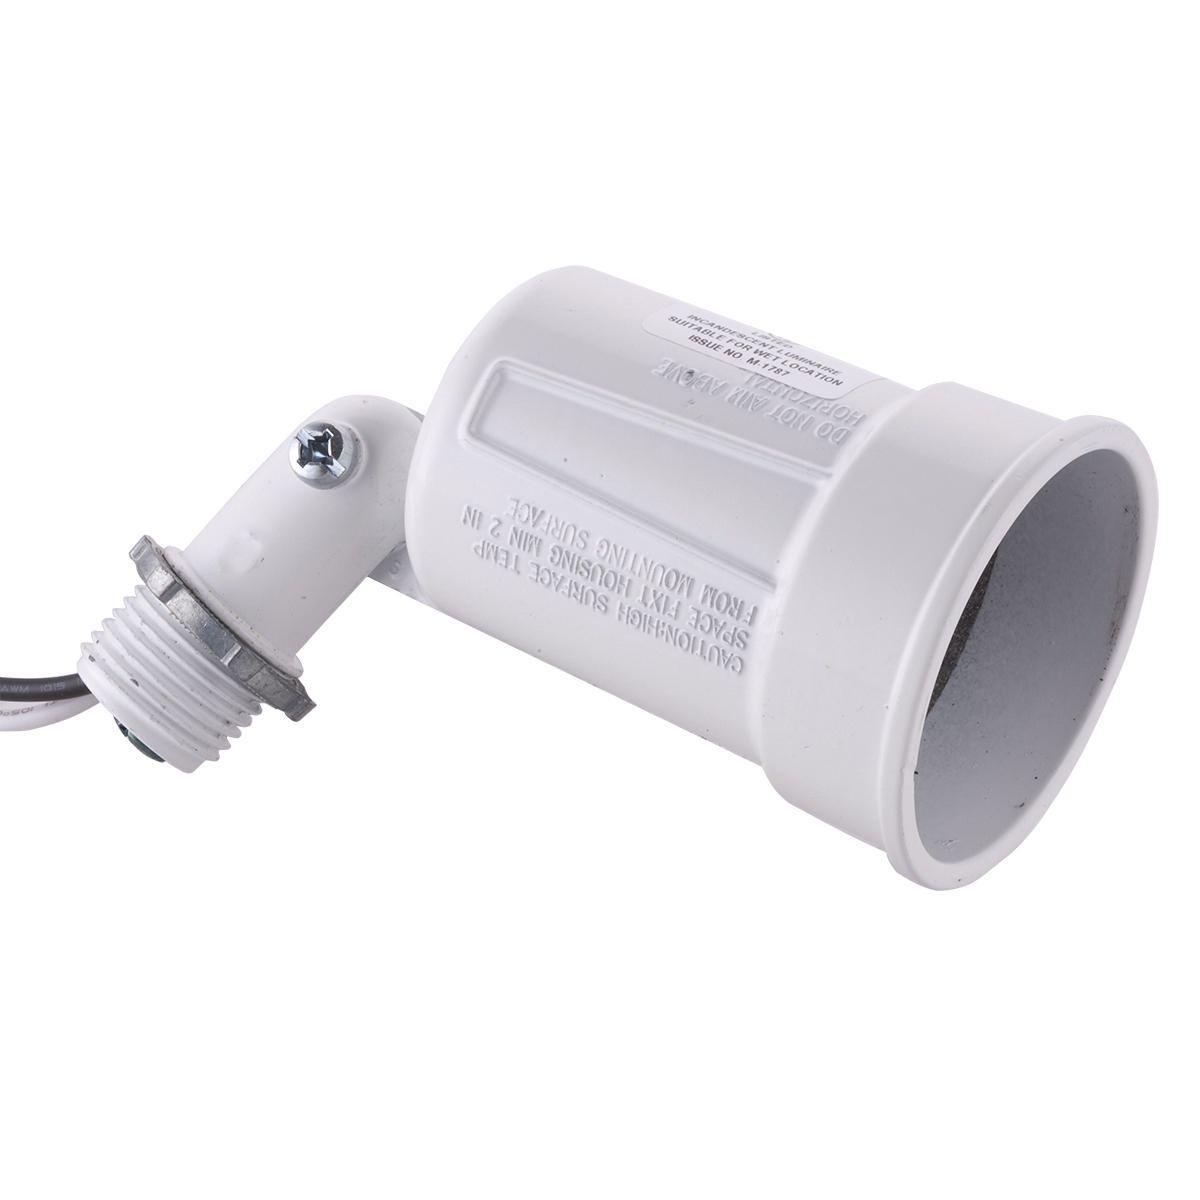 BELL,5606-1,WEATHERPROOF LAMPHOLDER WHITE